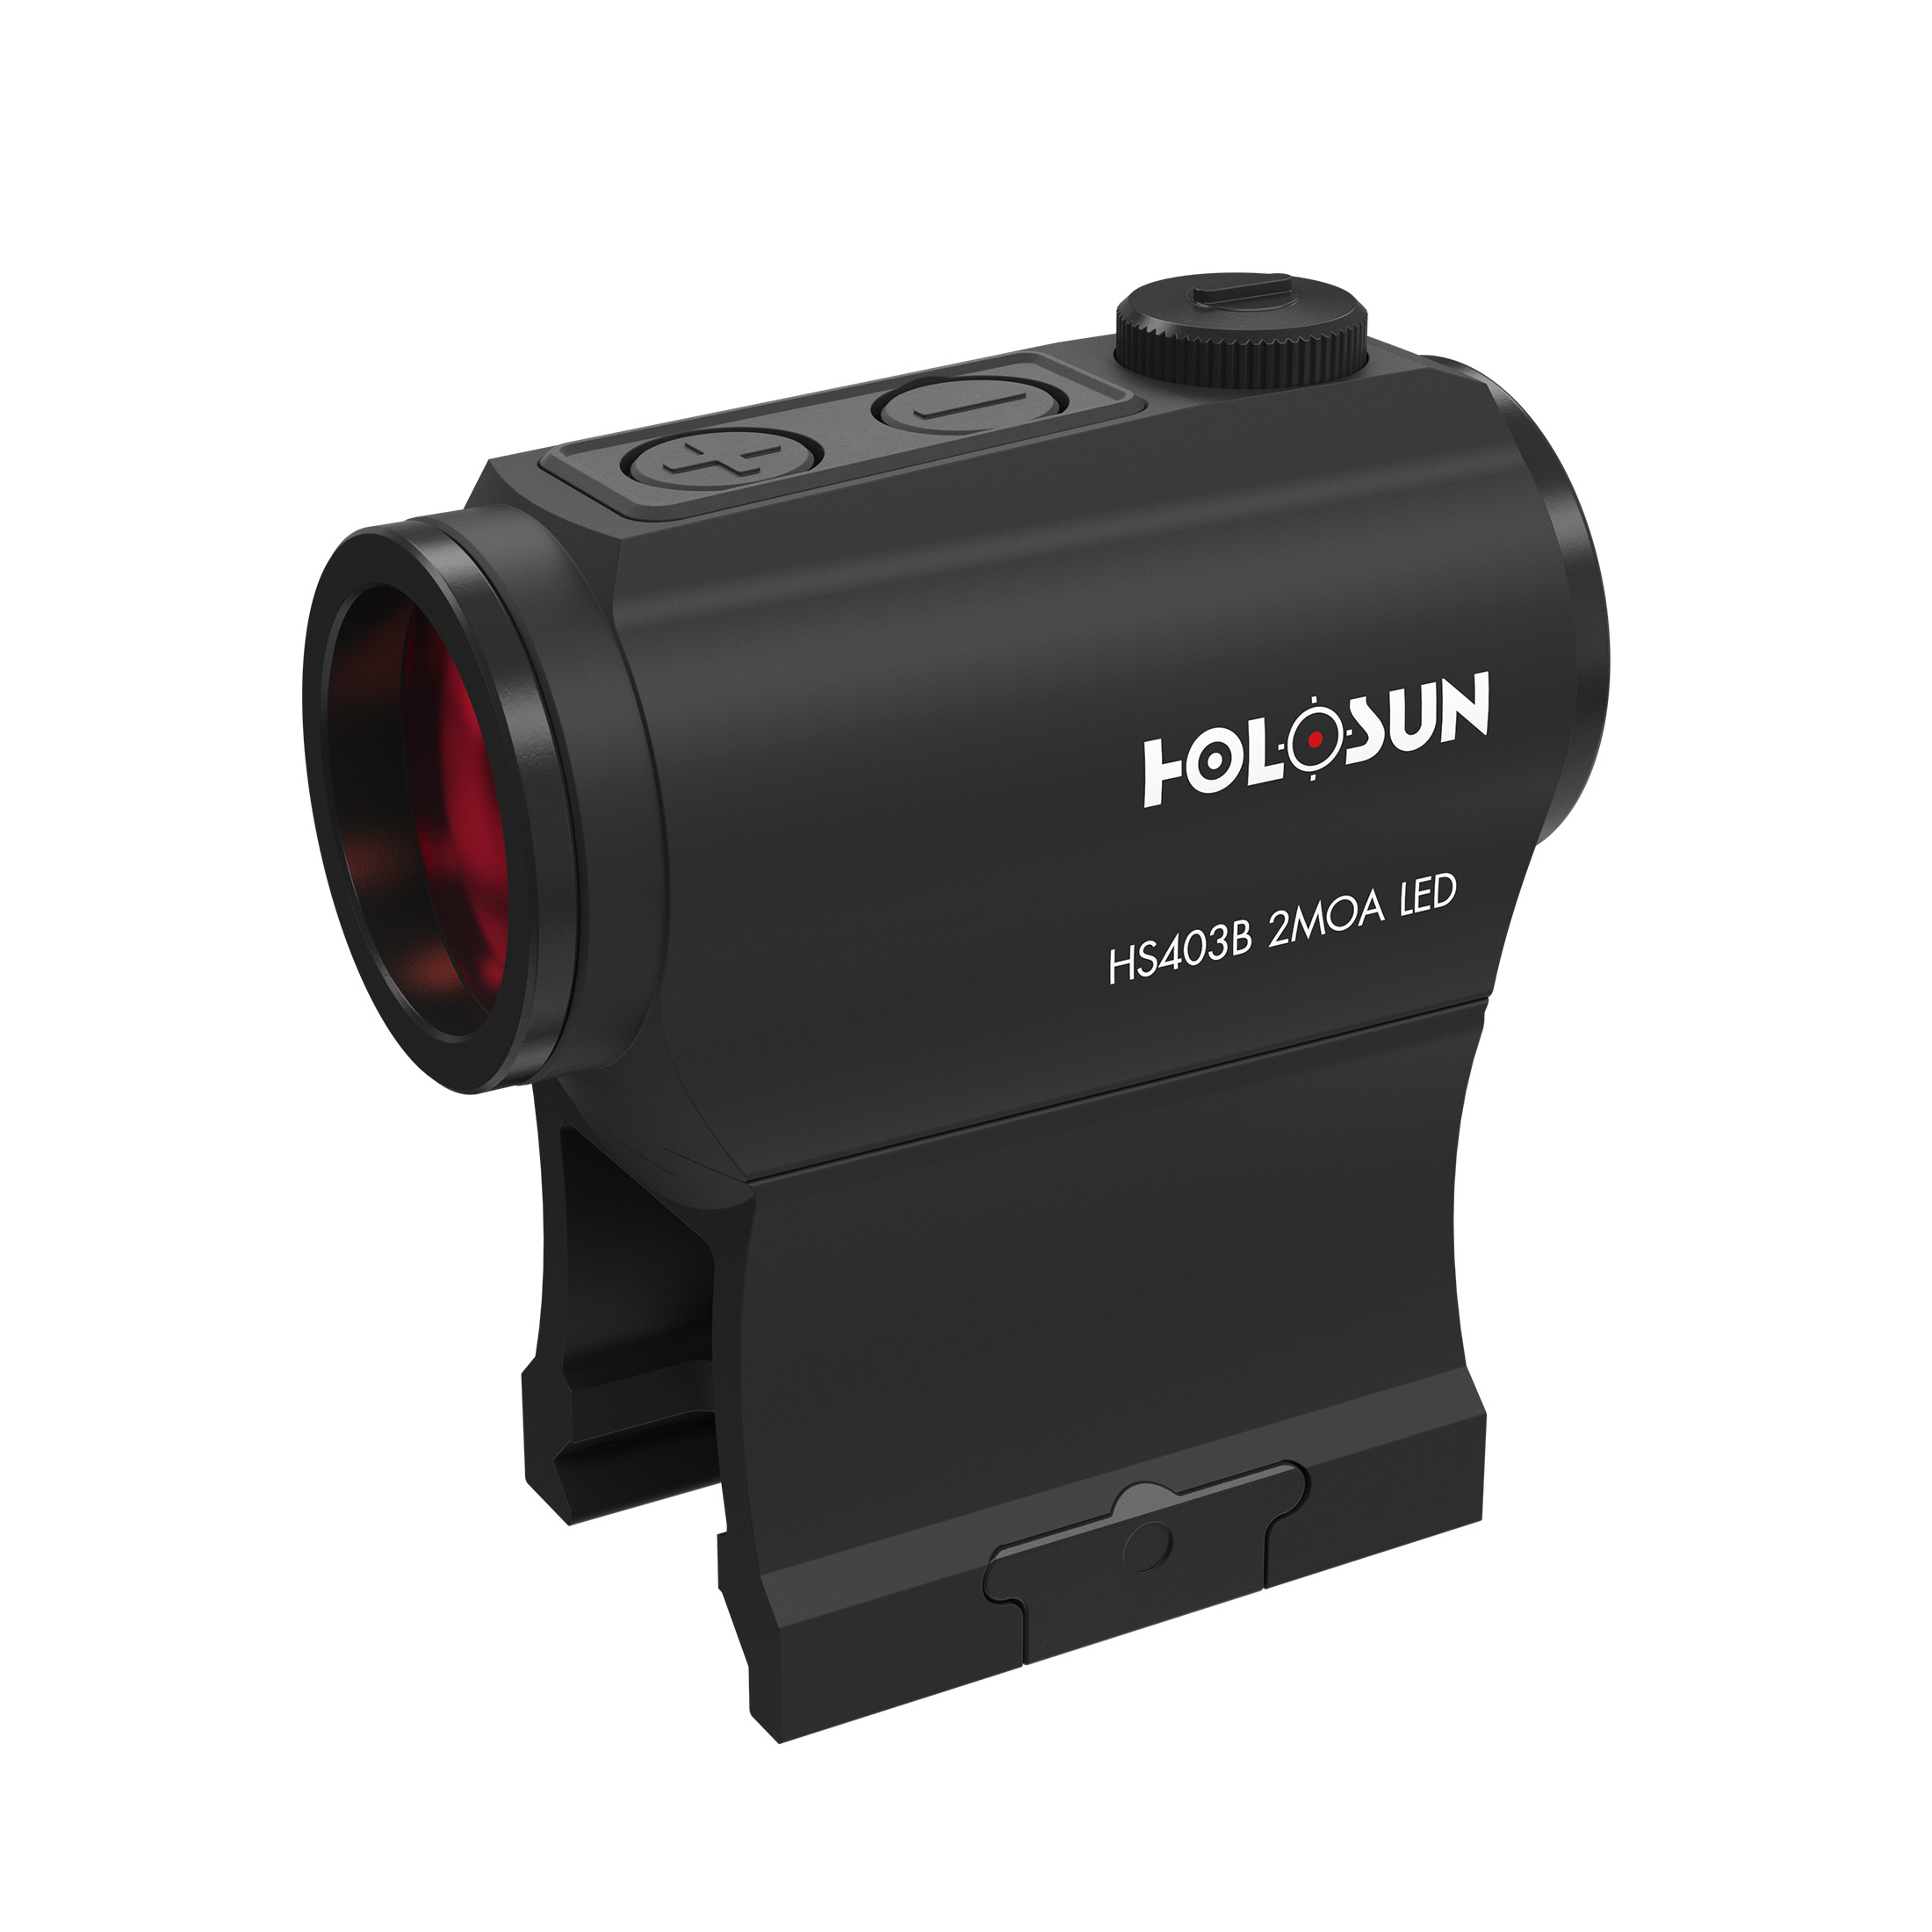 Holosun CLASSIC HS403B-RENEWED